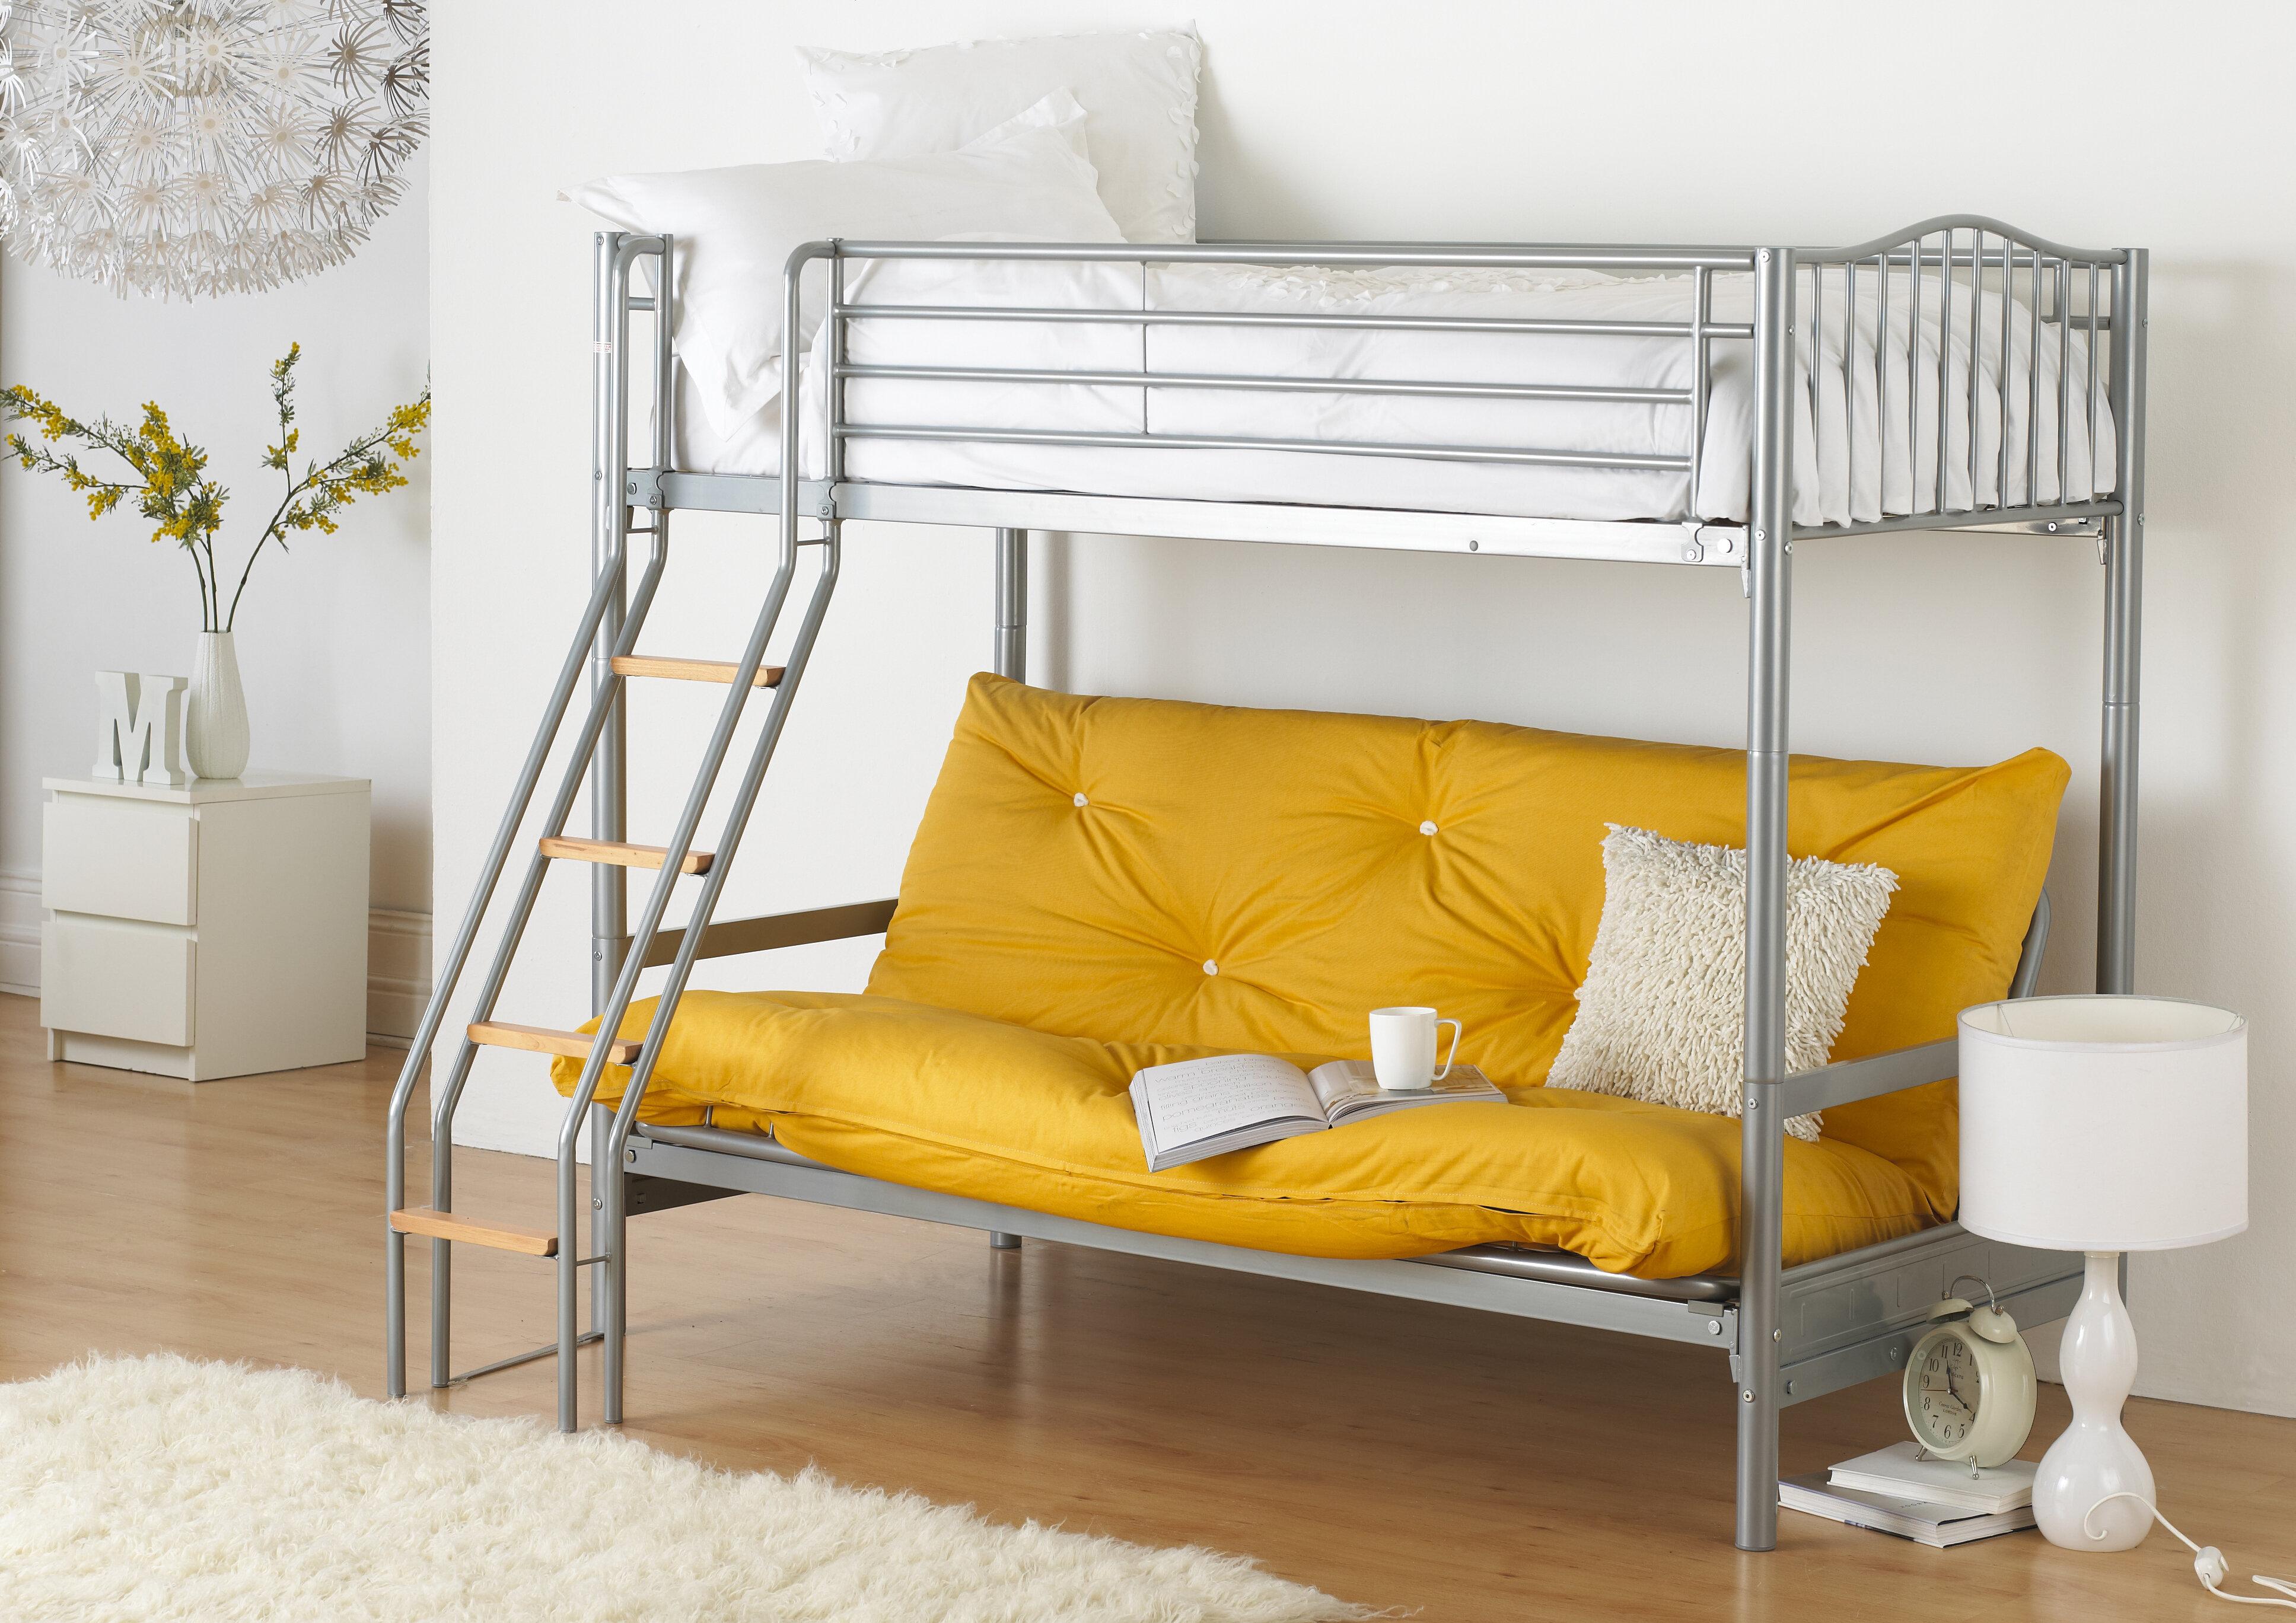 Etagenbett Wayfair : Just kids futon etagenbett halkyn wayfair